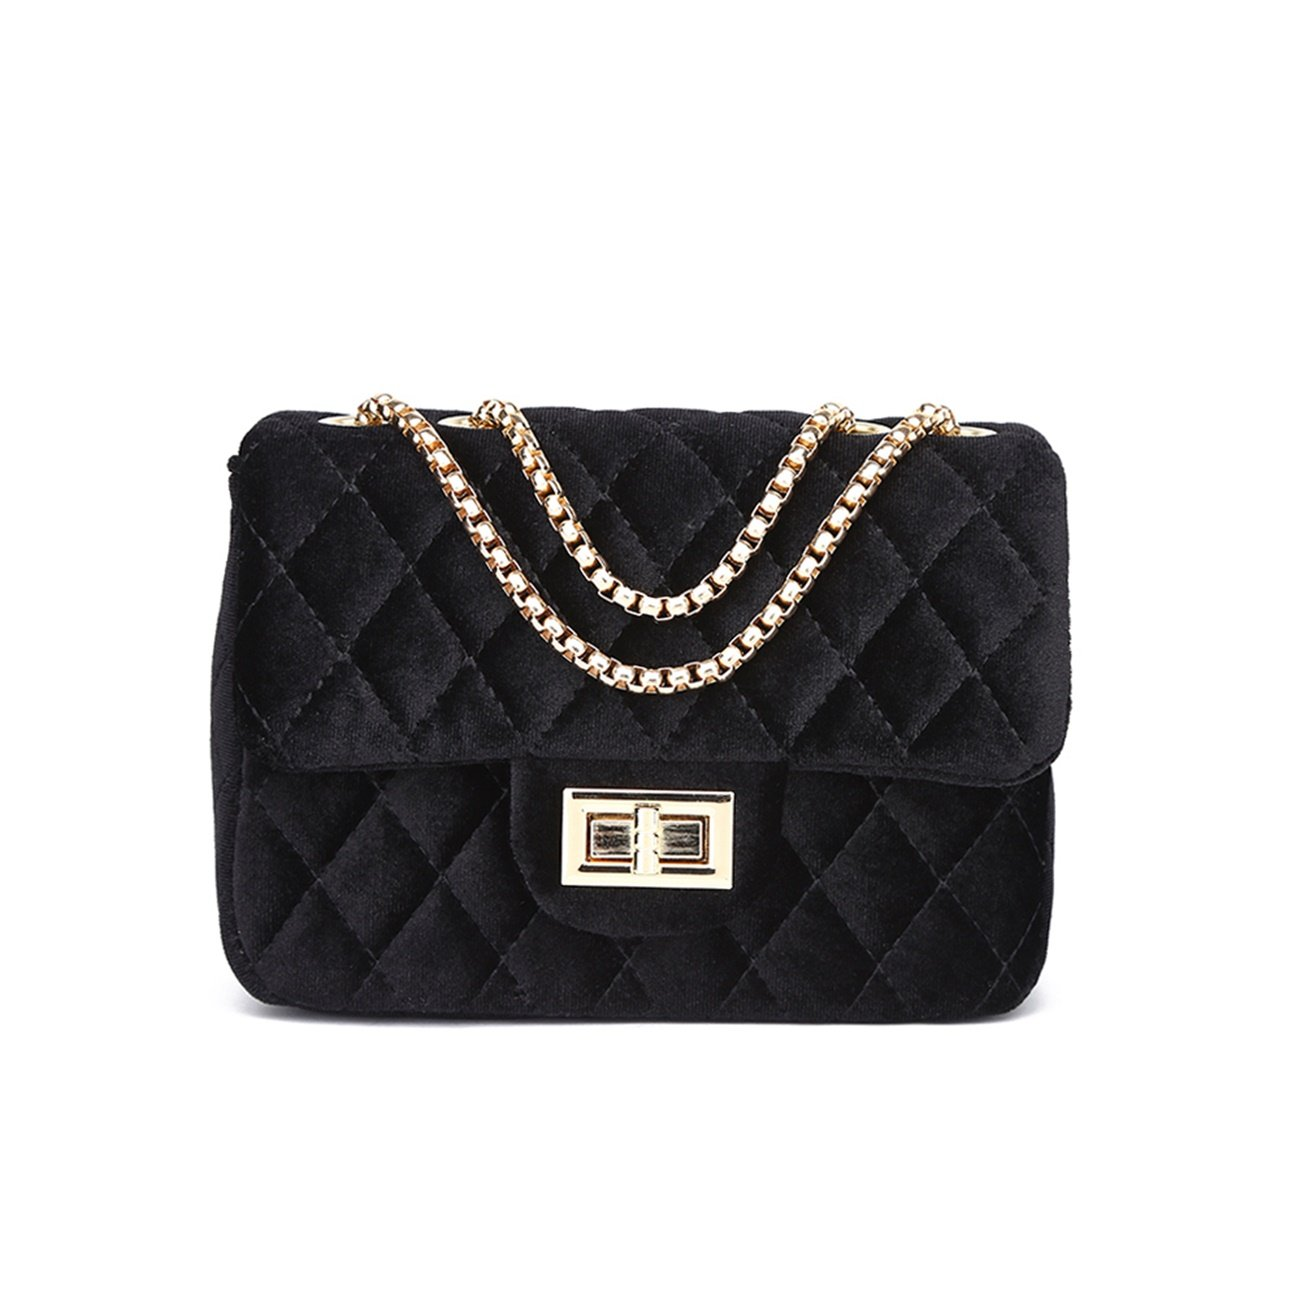 LeahWard Women s Quilted Velvet Chain Strap Cross Body Handbags Bag  Shoulder Bag (BLACK 20cmX14cm)  Amazon.co.uk  Shoes   Bags afdaad06d3143